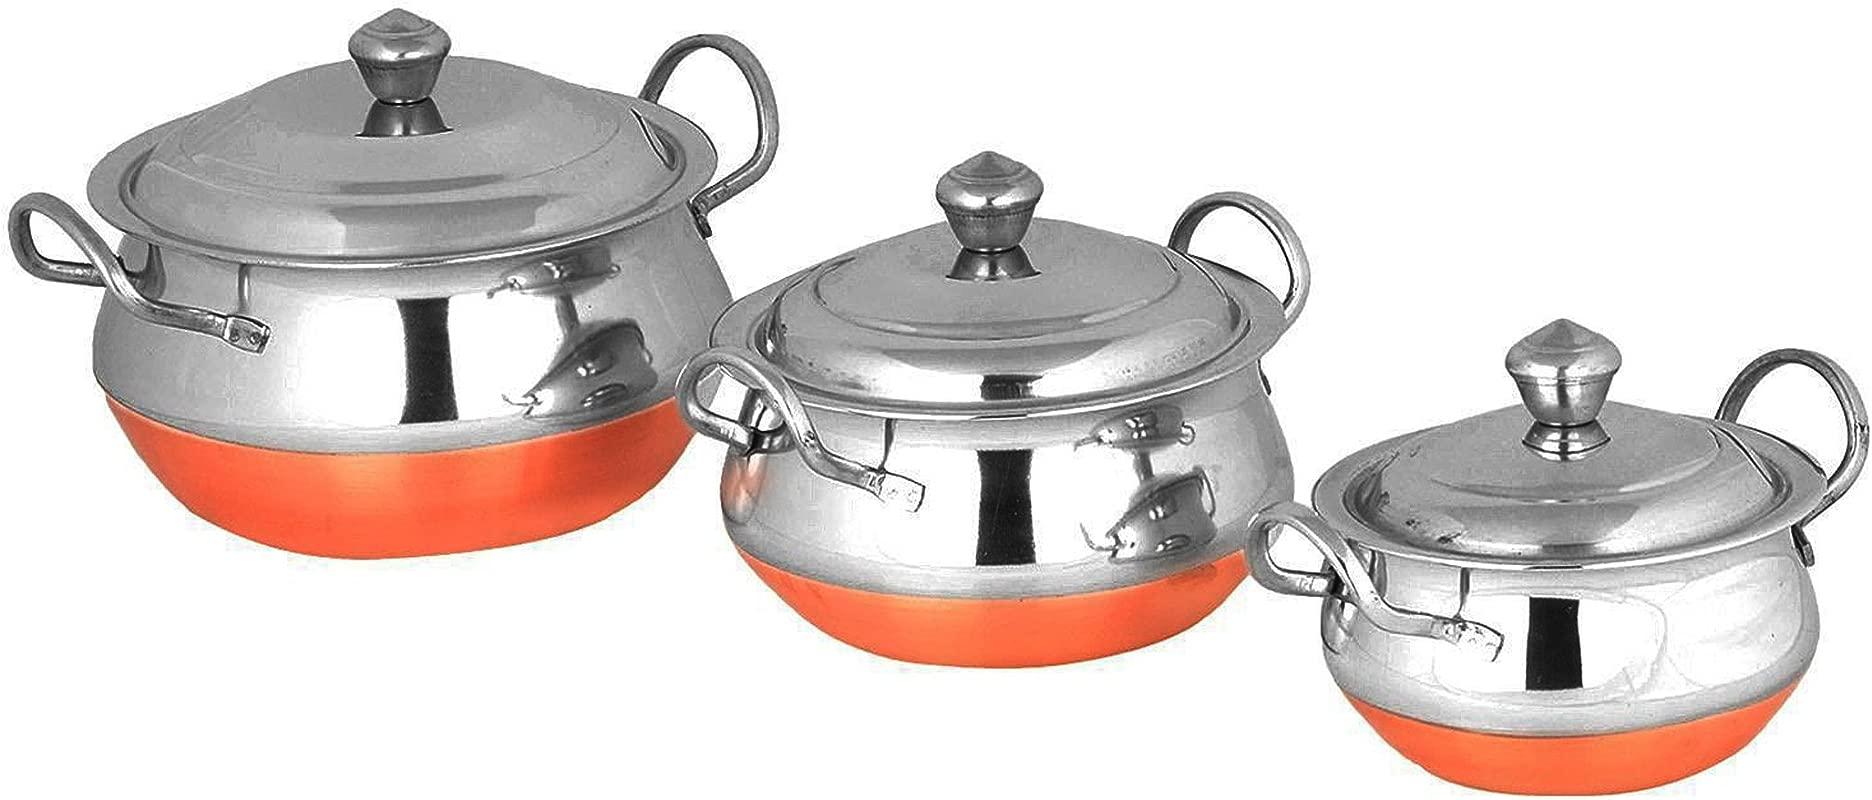 PARIJAT HANDICRAFT Stainless Steel Handi Cookware Set Of 3 Pcs PREMIUM Stainless Steel 3 Pcs Handi Cookware Set Copper Bottom